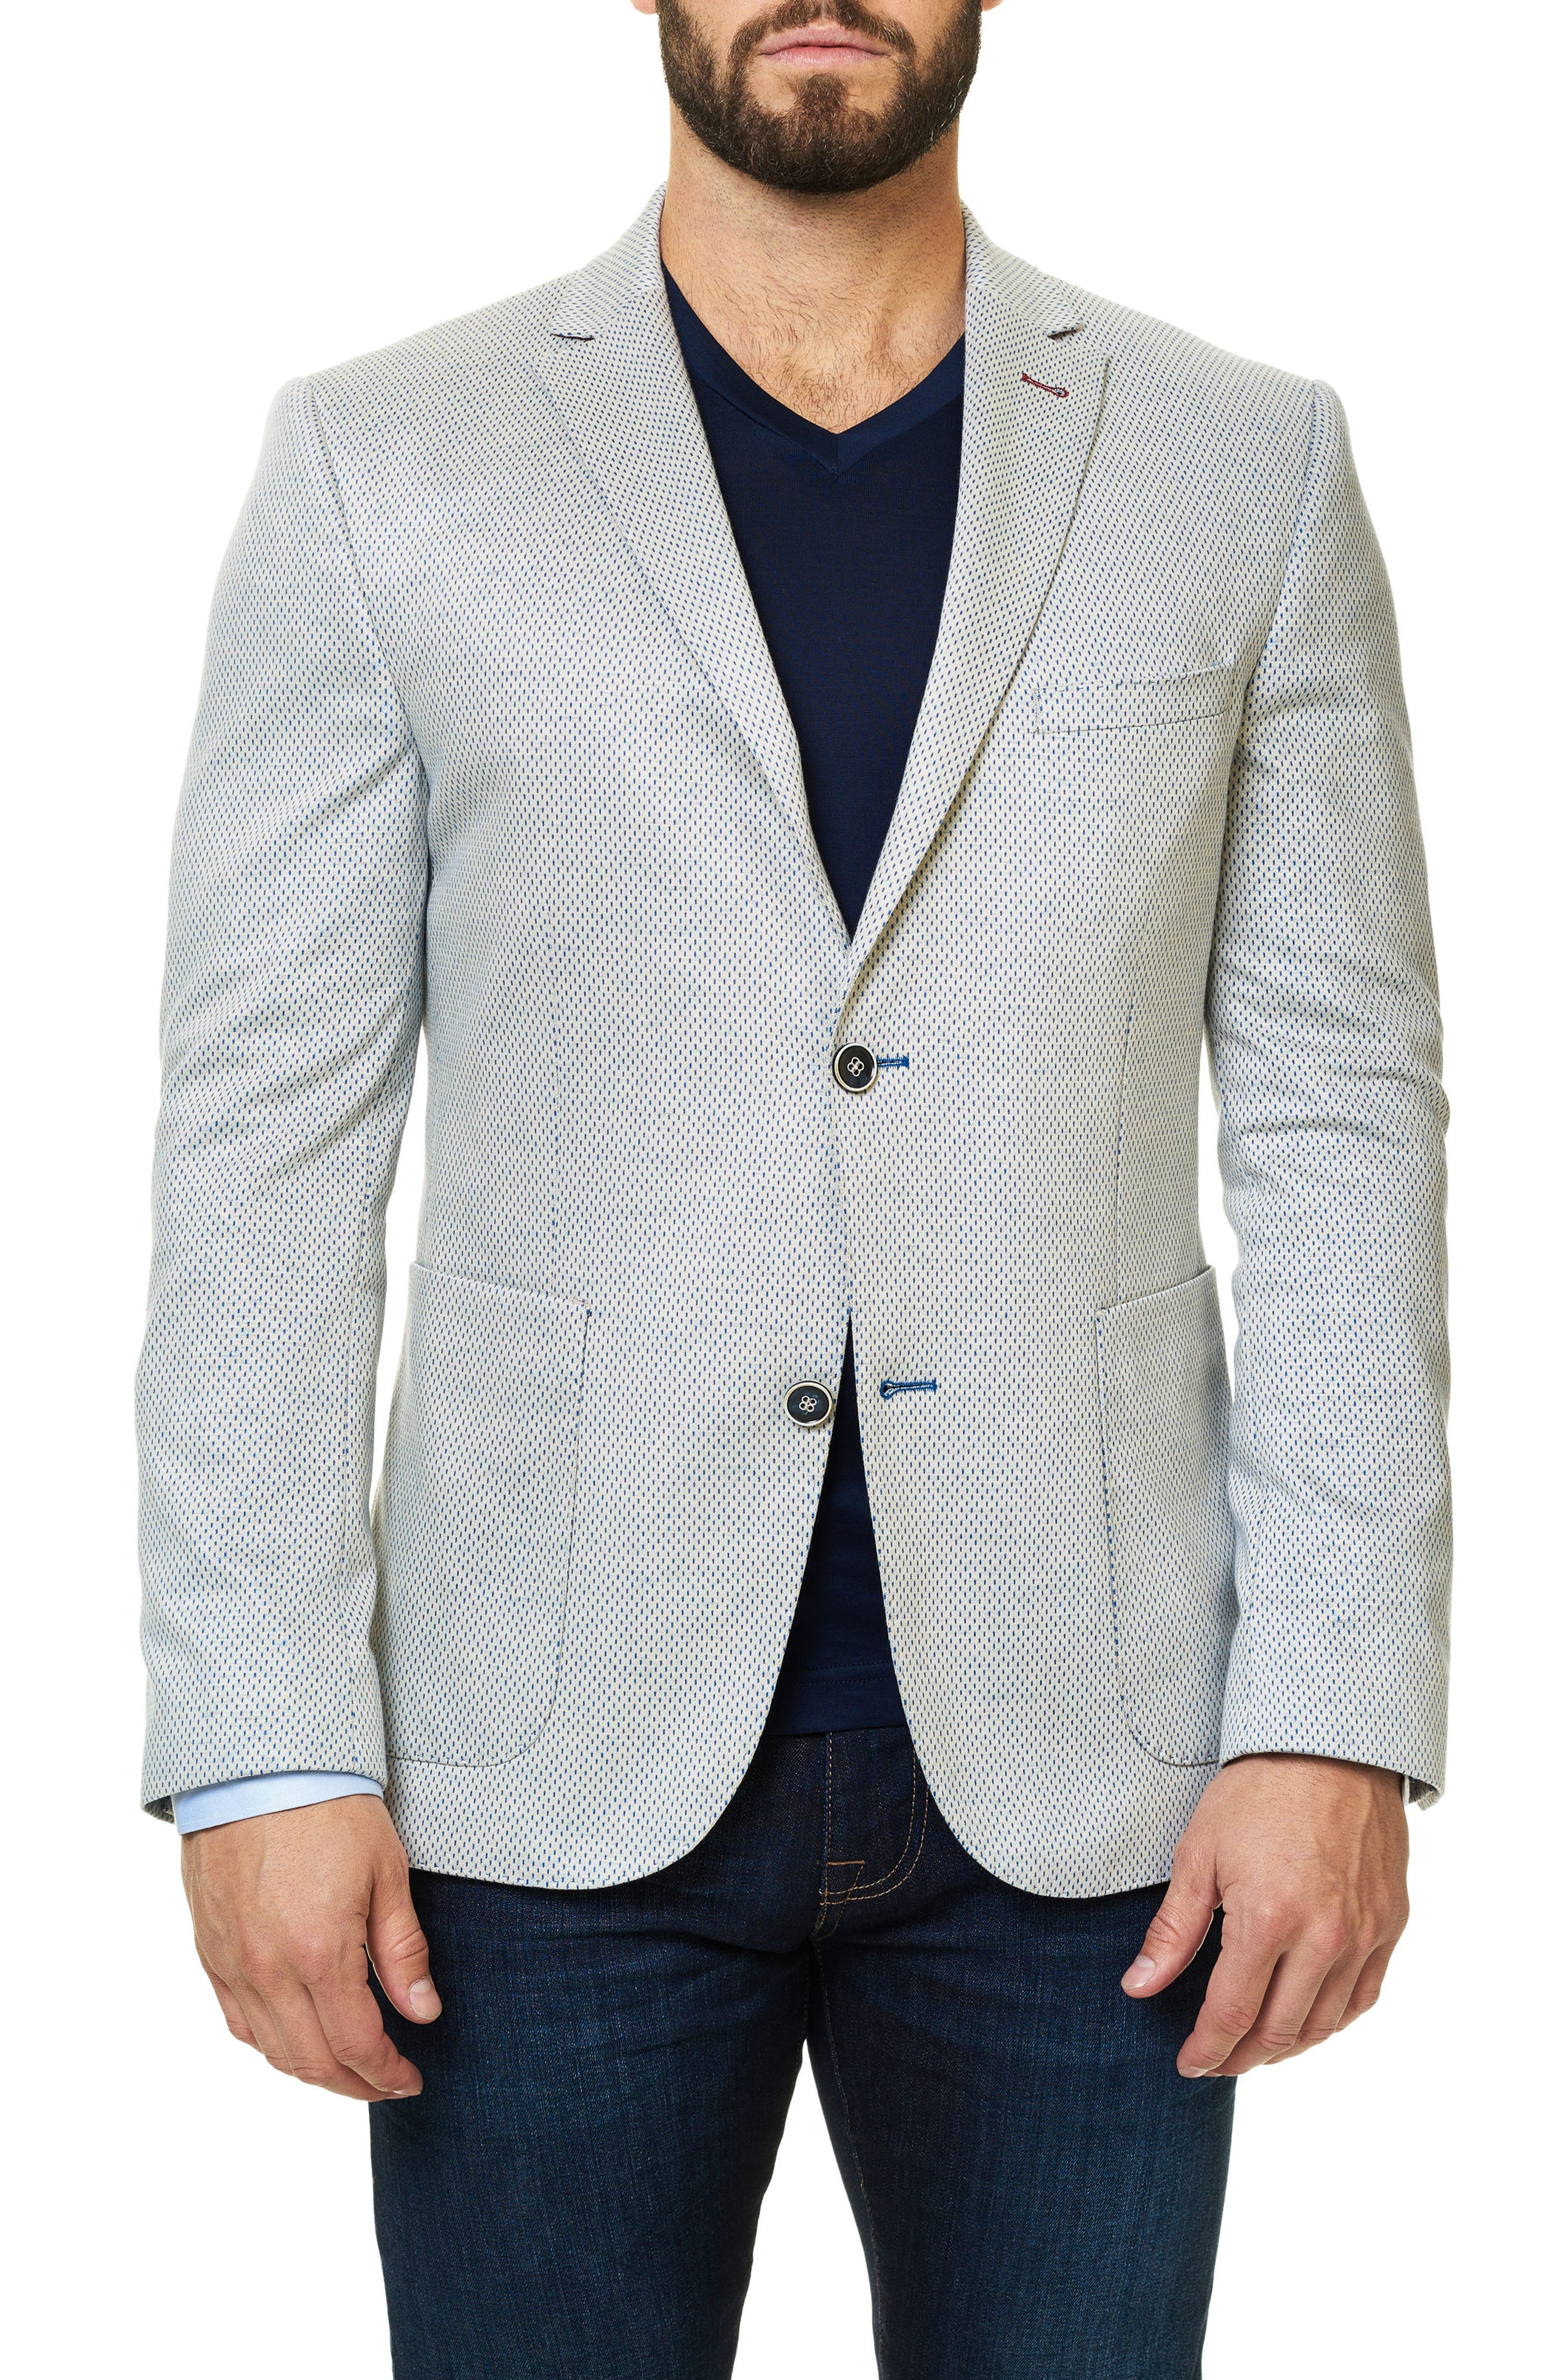 Maceoo Checkmate Dobby Dash Sport Coat